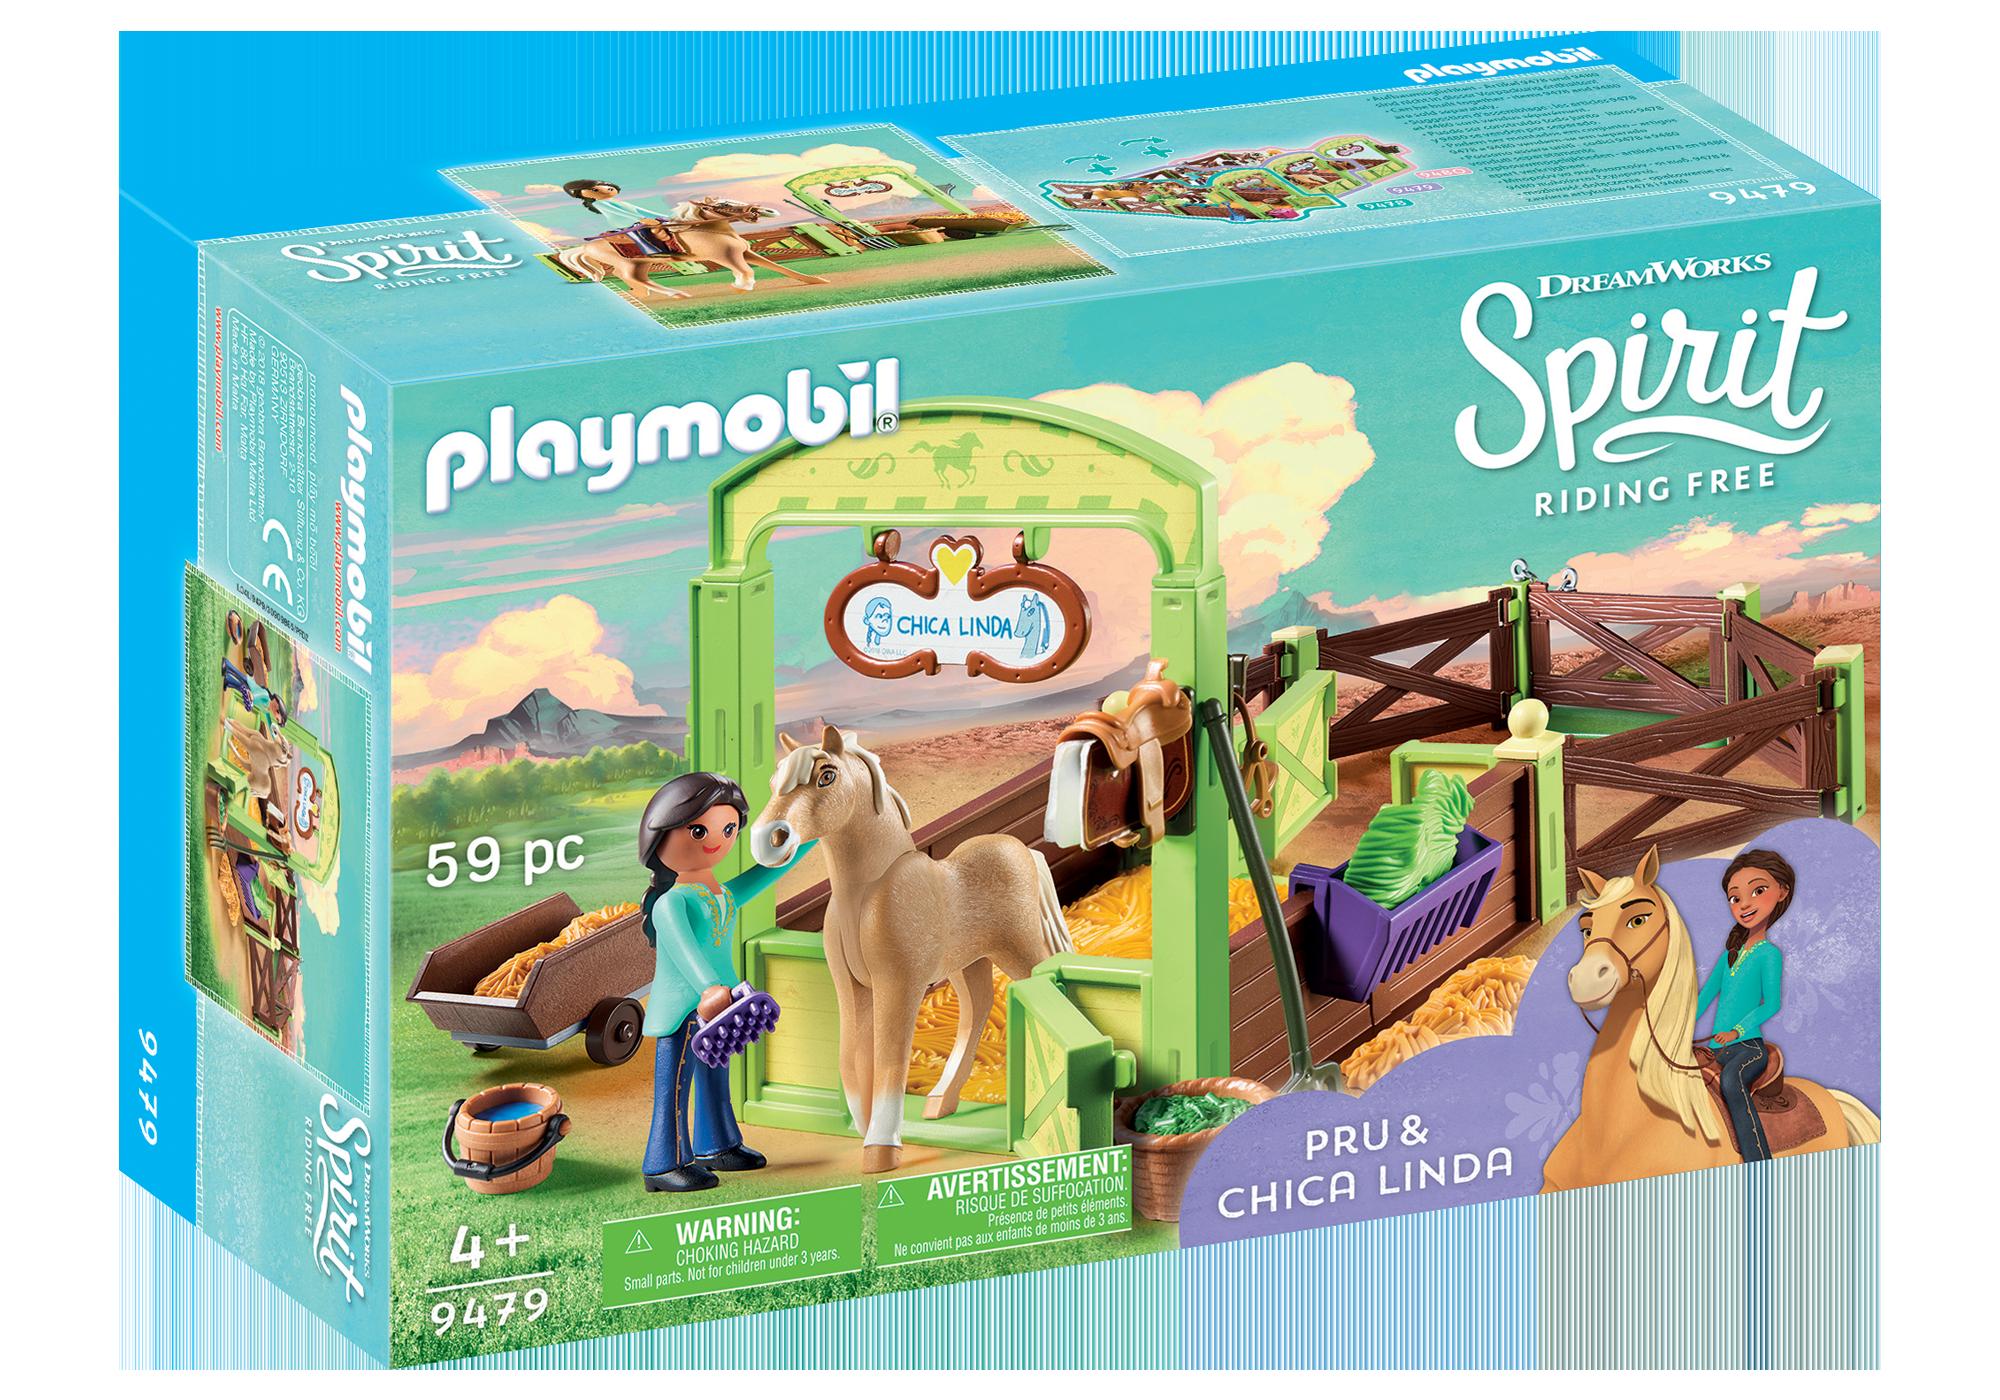 http://media.playmobil.com/i/playmobil/9479_product_box_front/Apo et Chica Linda avec box